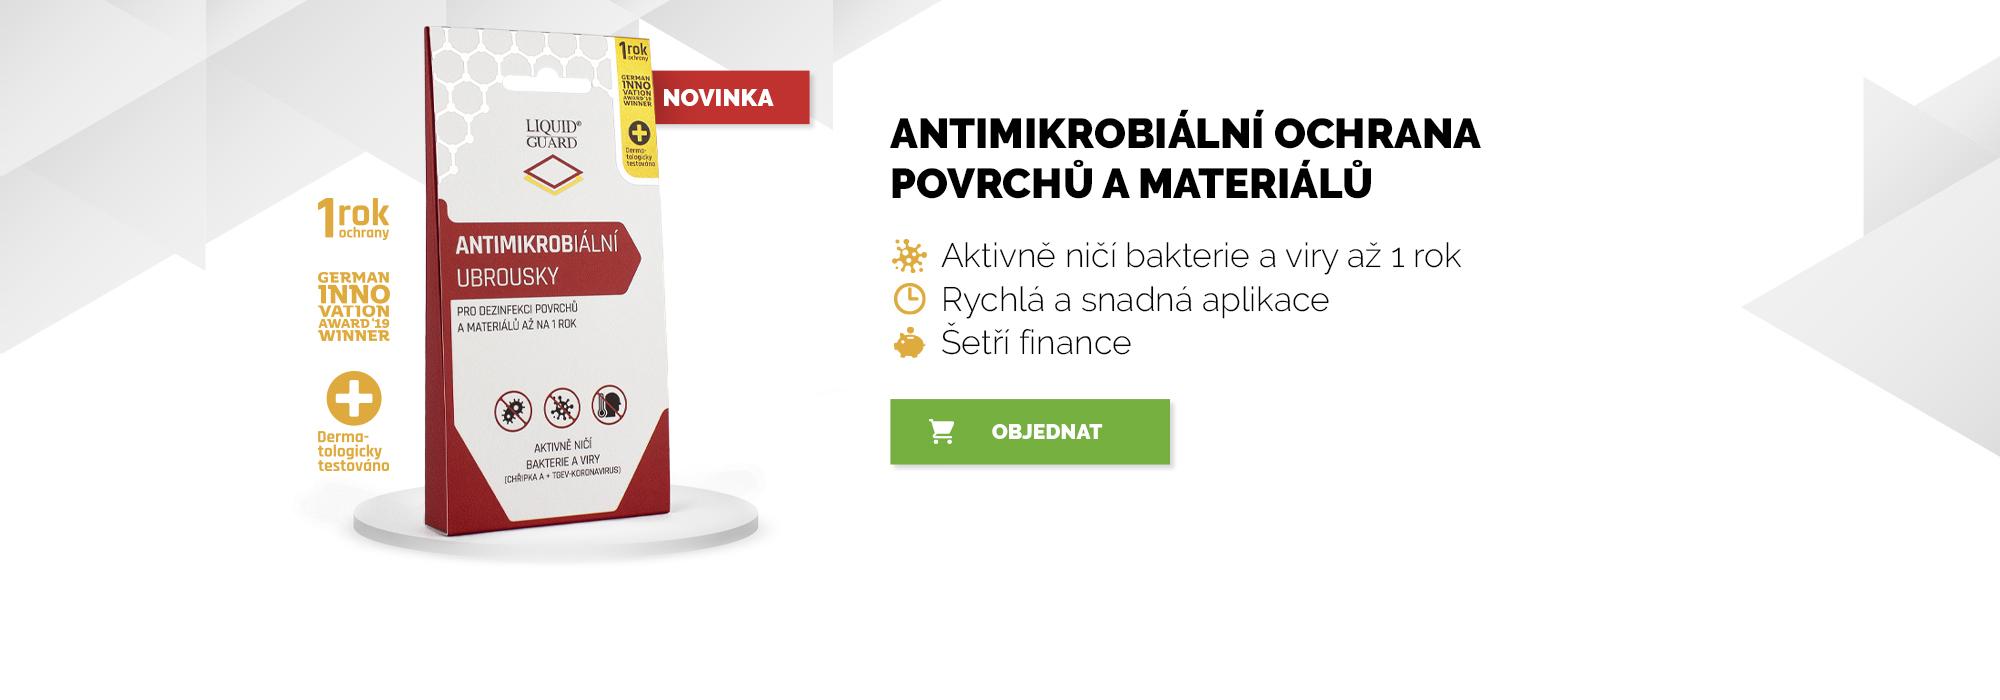 Liquid Guard - Antimikrobiální ochrana povrchů a materiálů